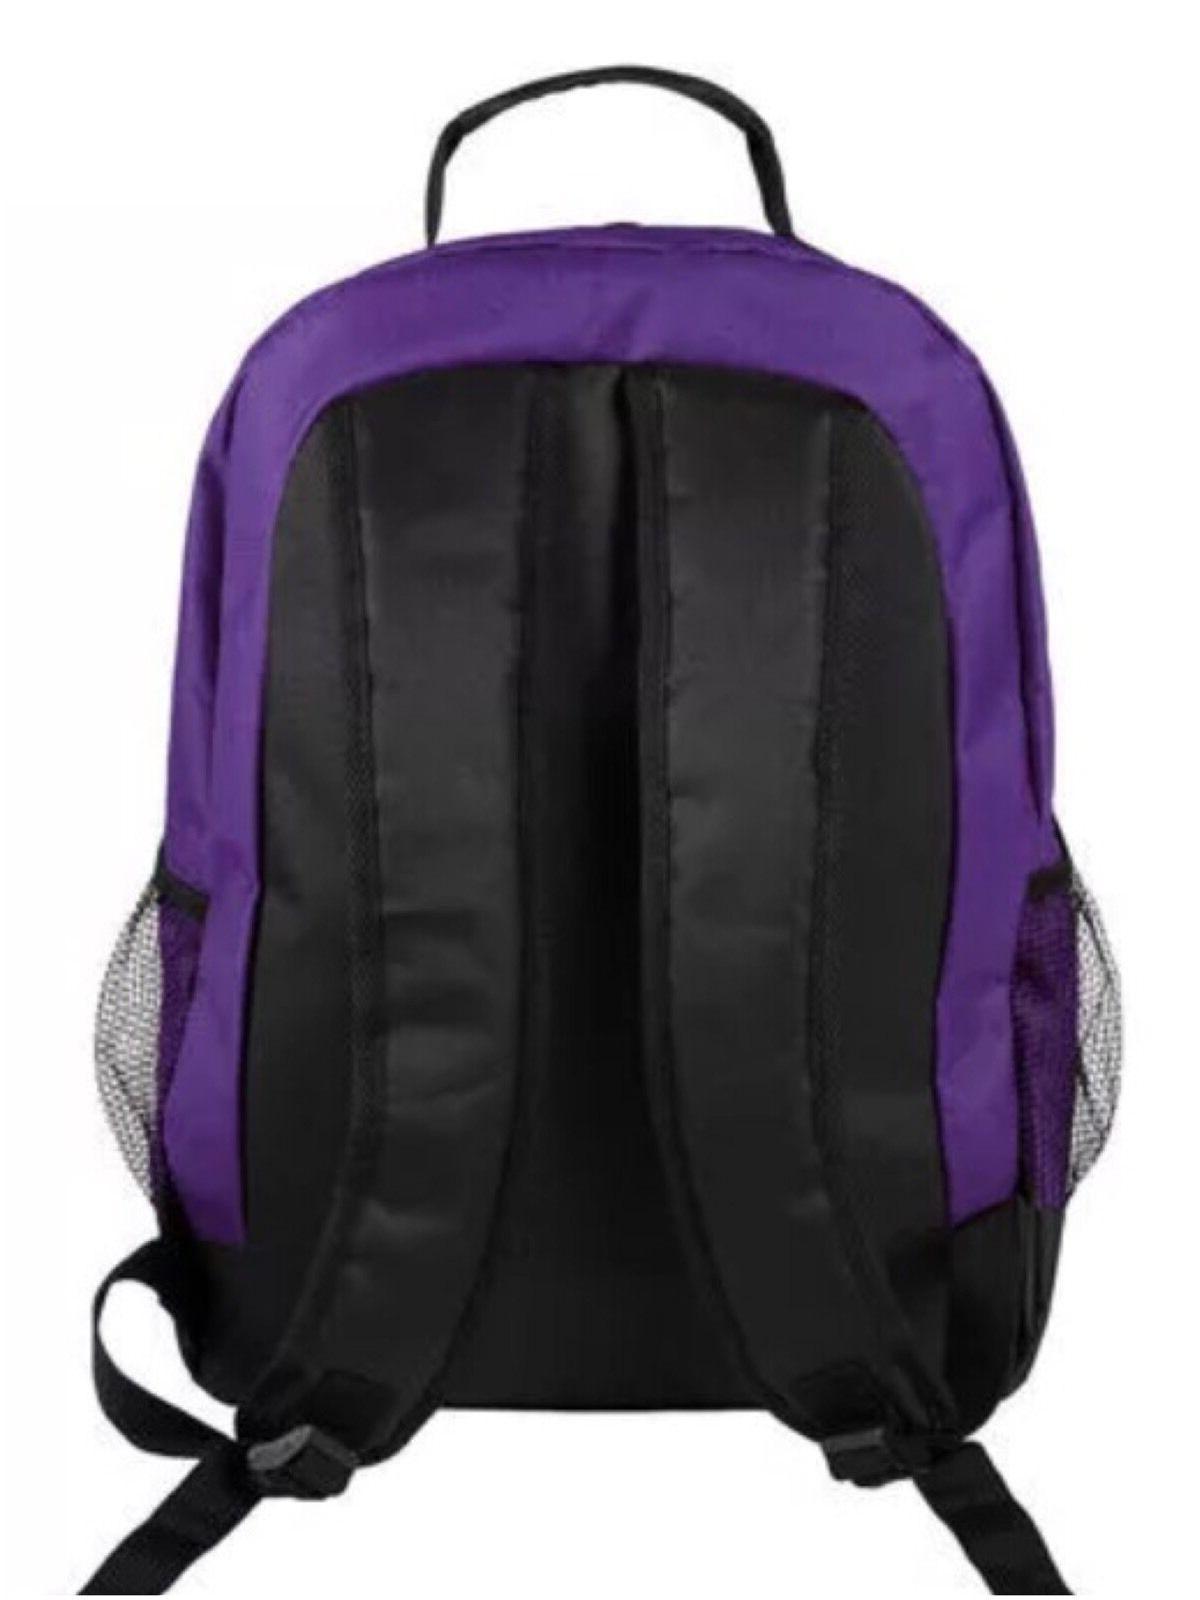 Minnesota Vikings Backpack Bag